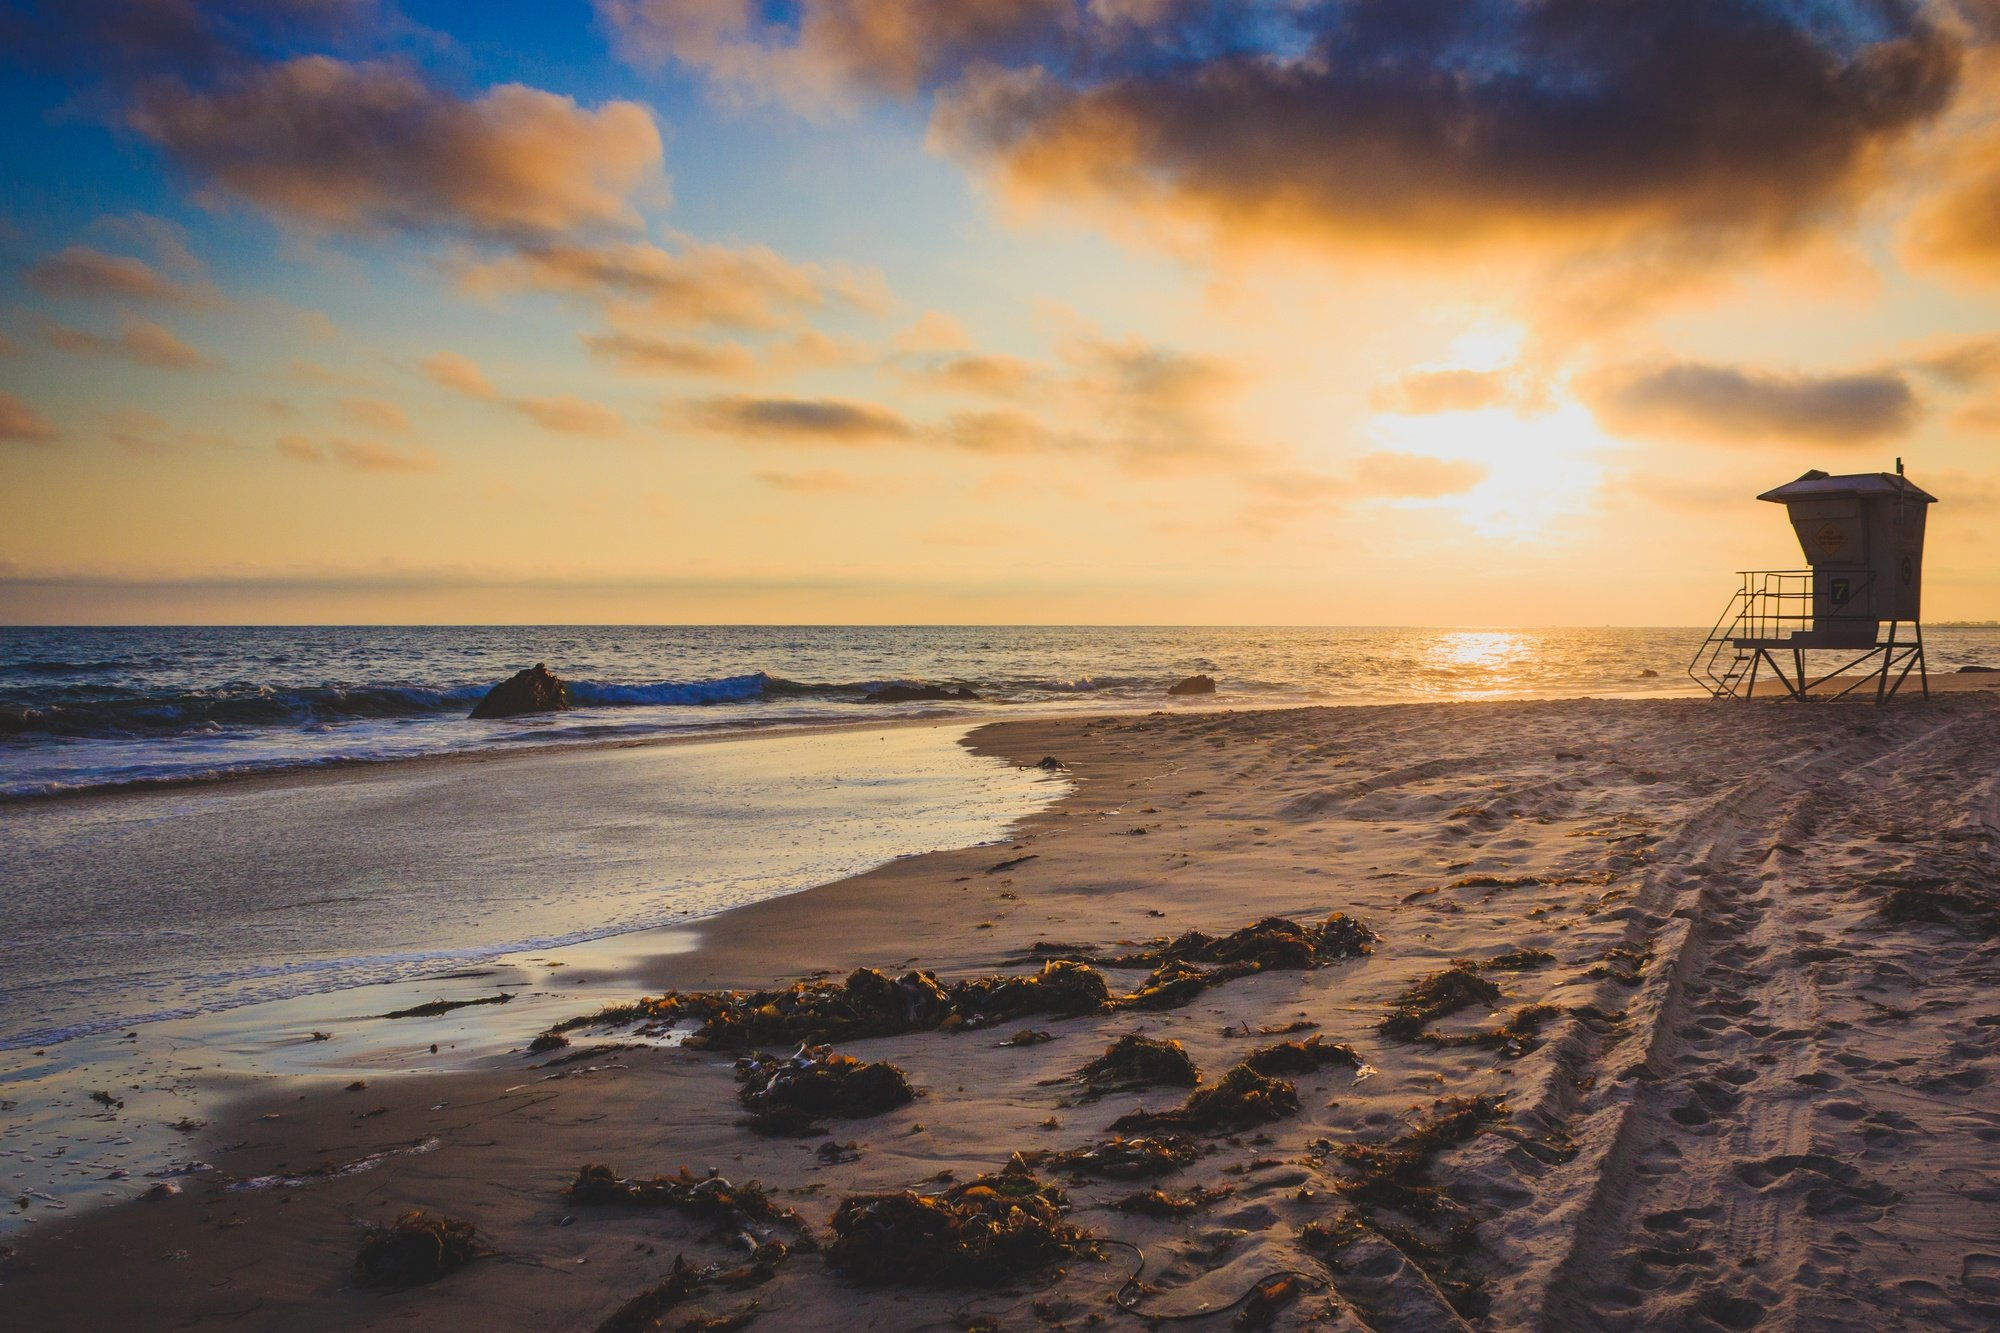 Crystal Cove Beach in Orange County, CA